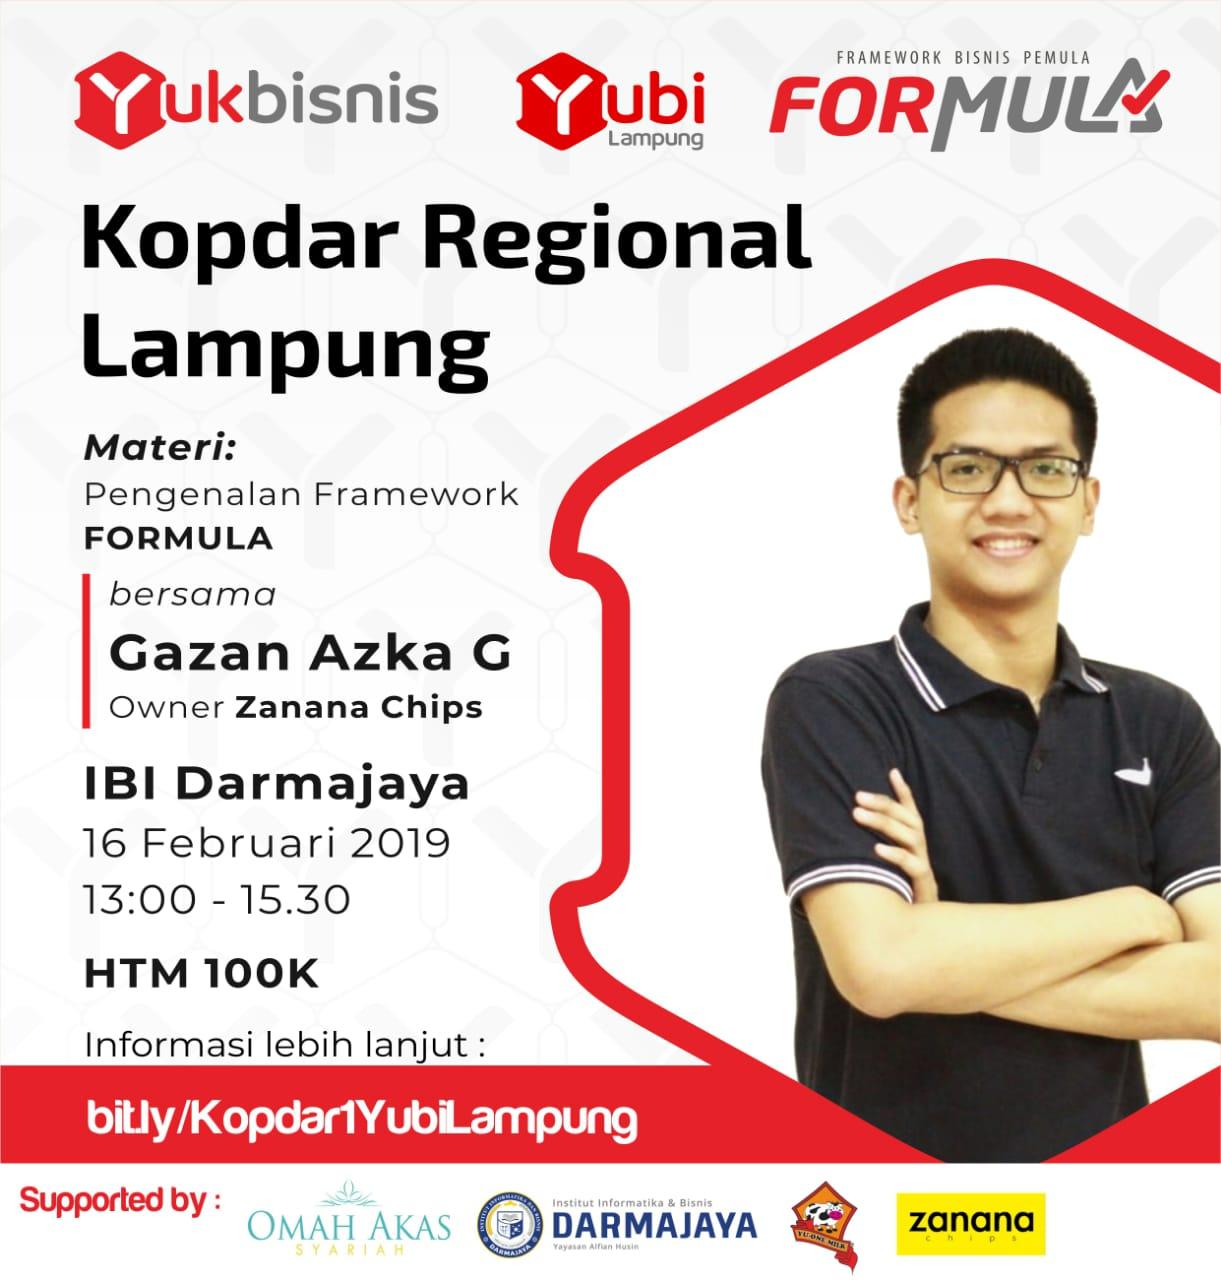 Kolaborasi, Yubi Lampung – IIB Darmajaya Gelar Pengenalan Framework Formula